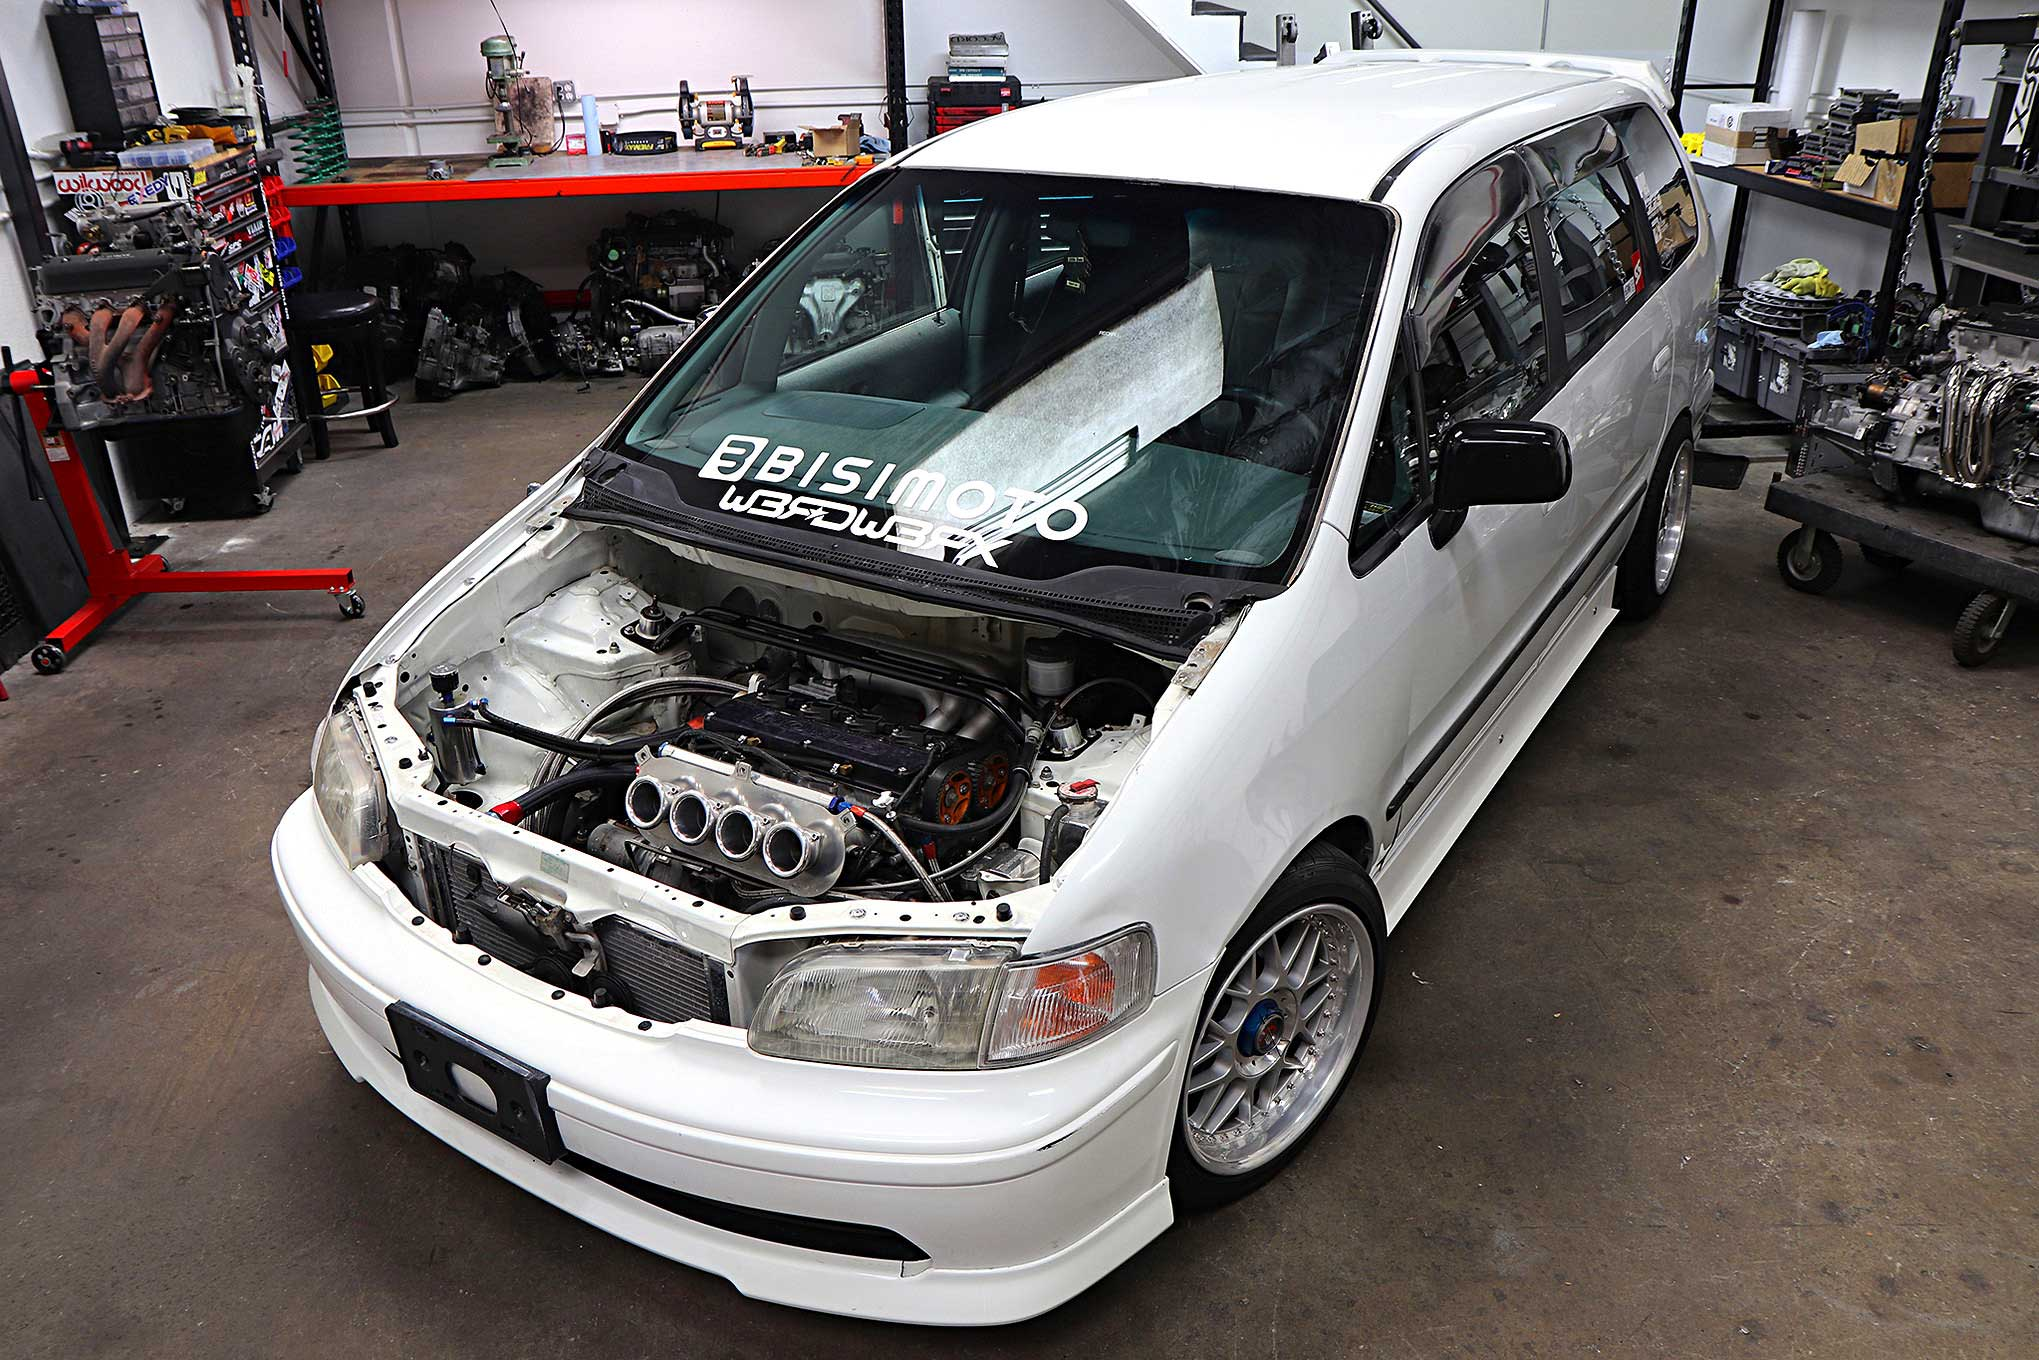 1995 Honda Odyssey LX Rebuild - Part 2Super Street